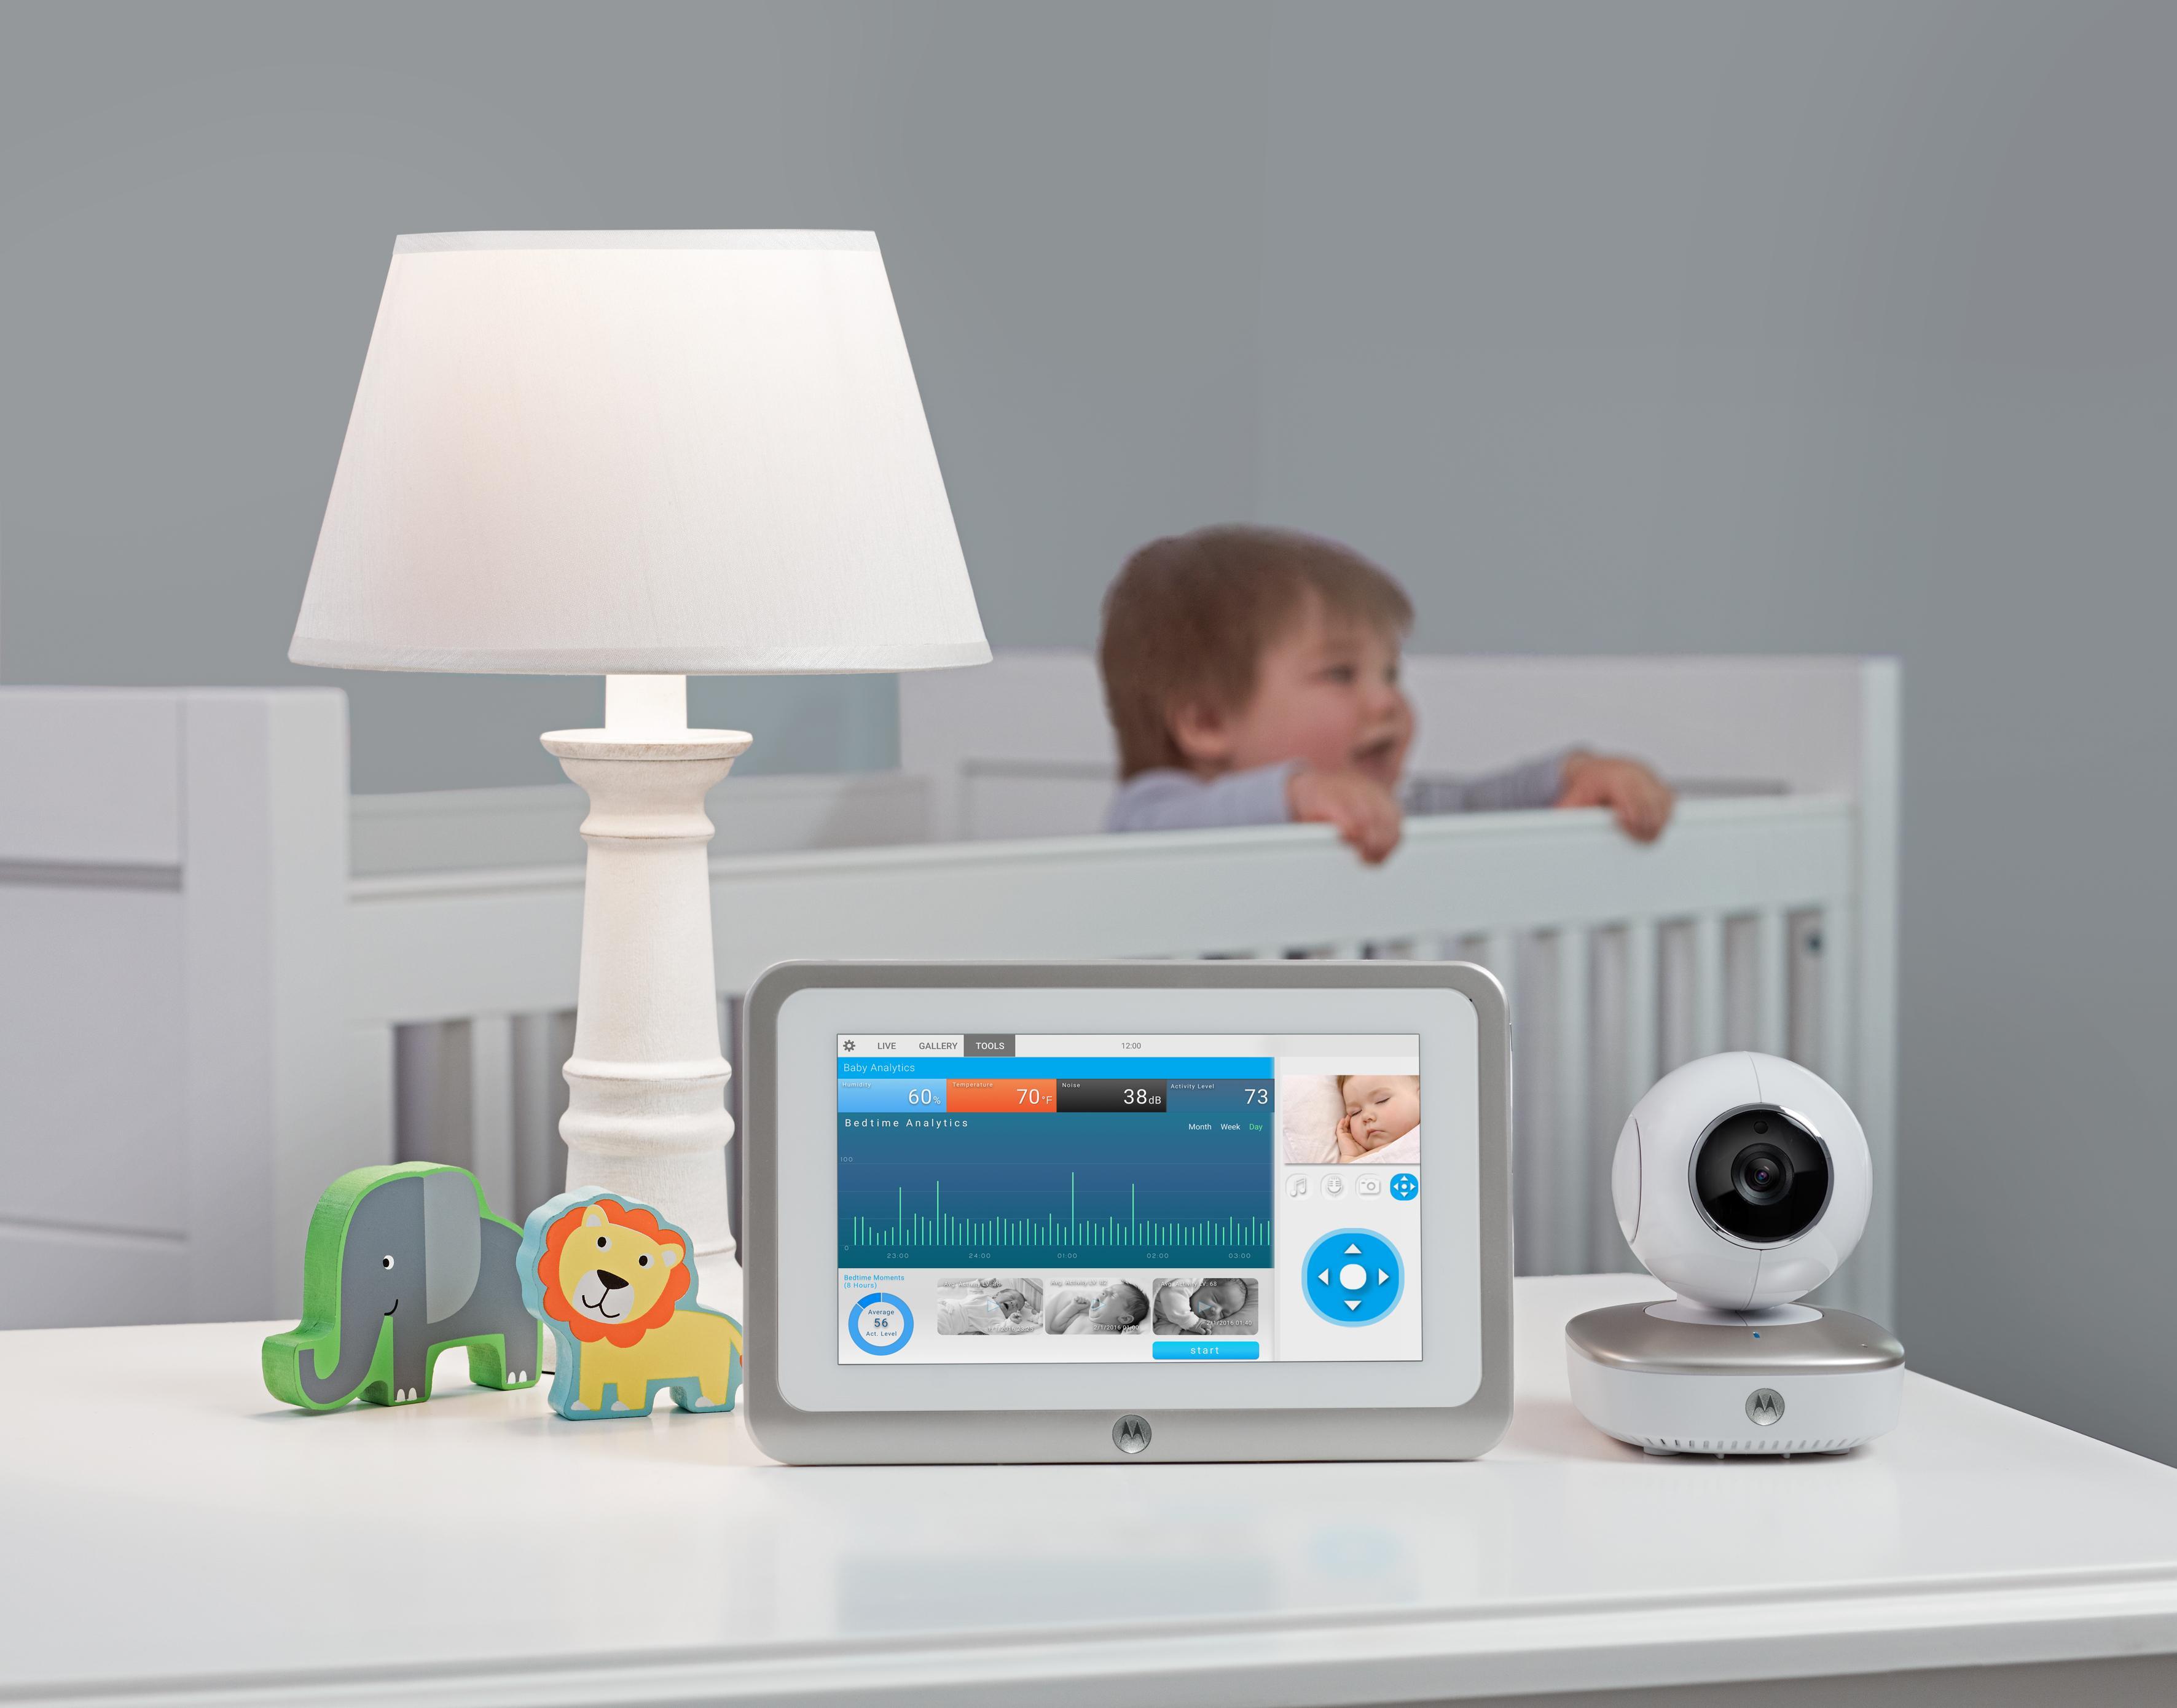 motorola smart nursery 7 baby monitor with 8gb sd card ebay. Black Bedroom Furniture Sets. Home Design Ideas